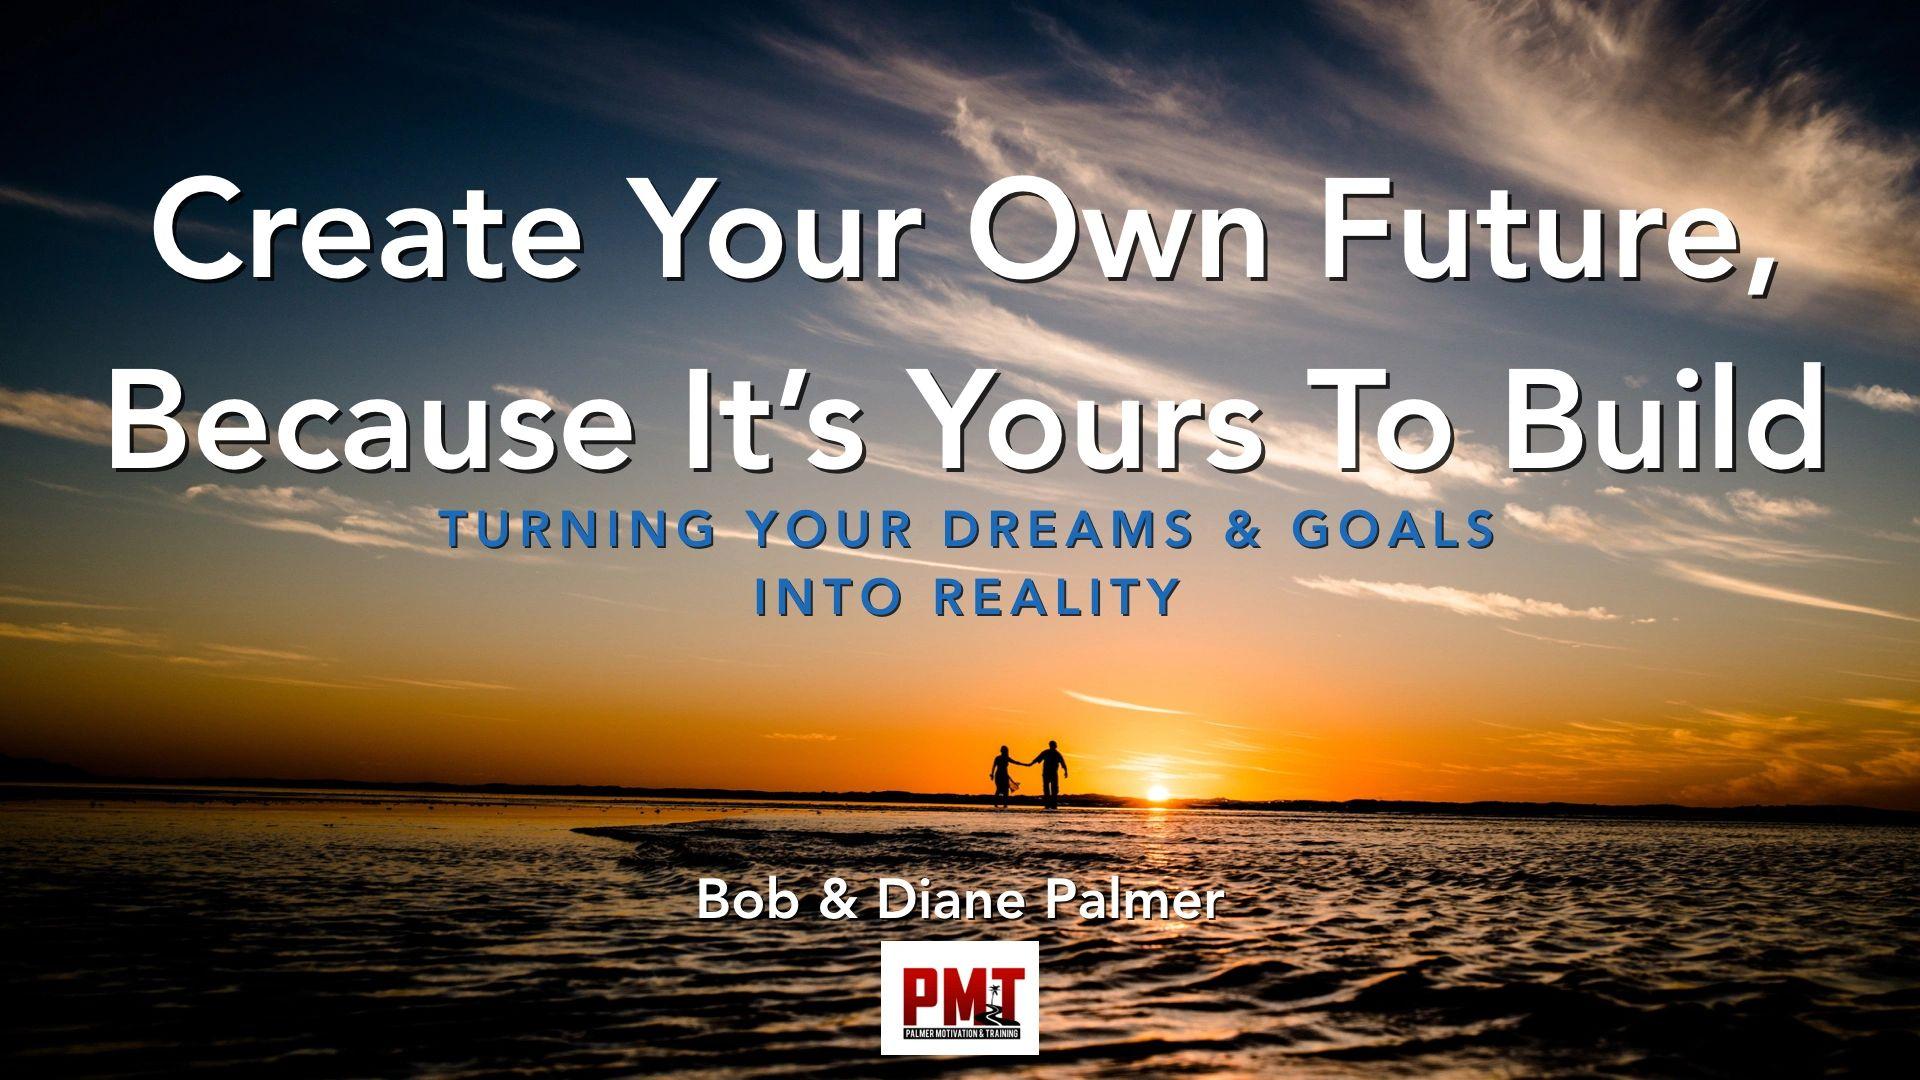 Palmer Motivation